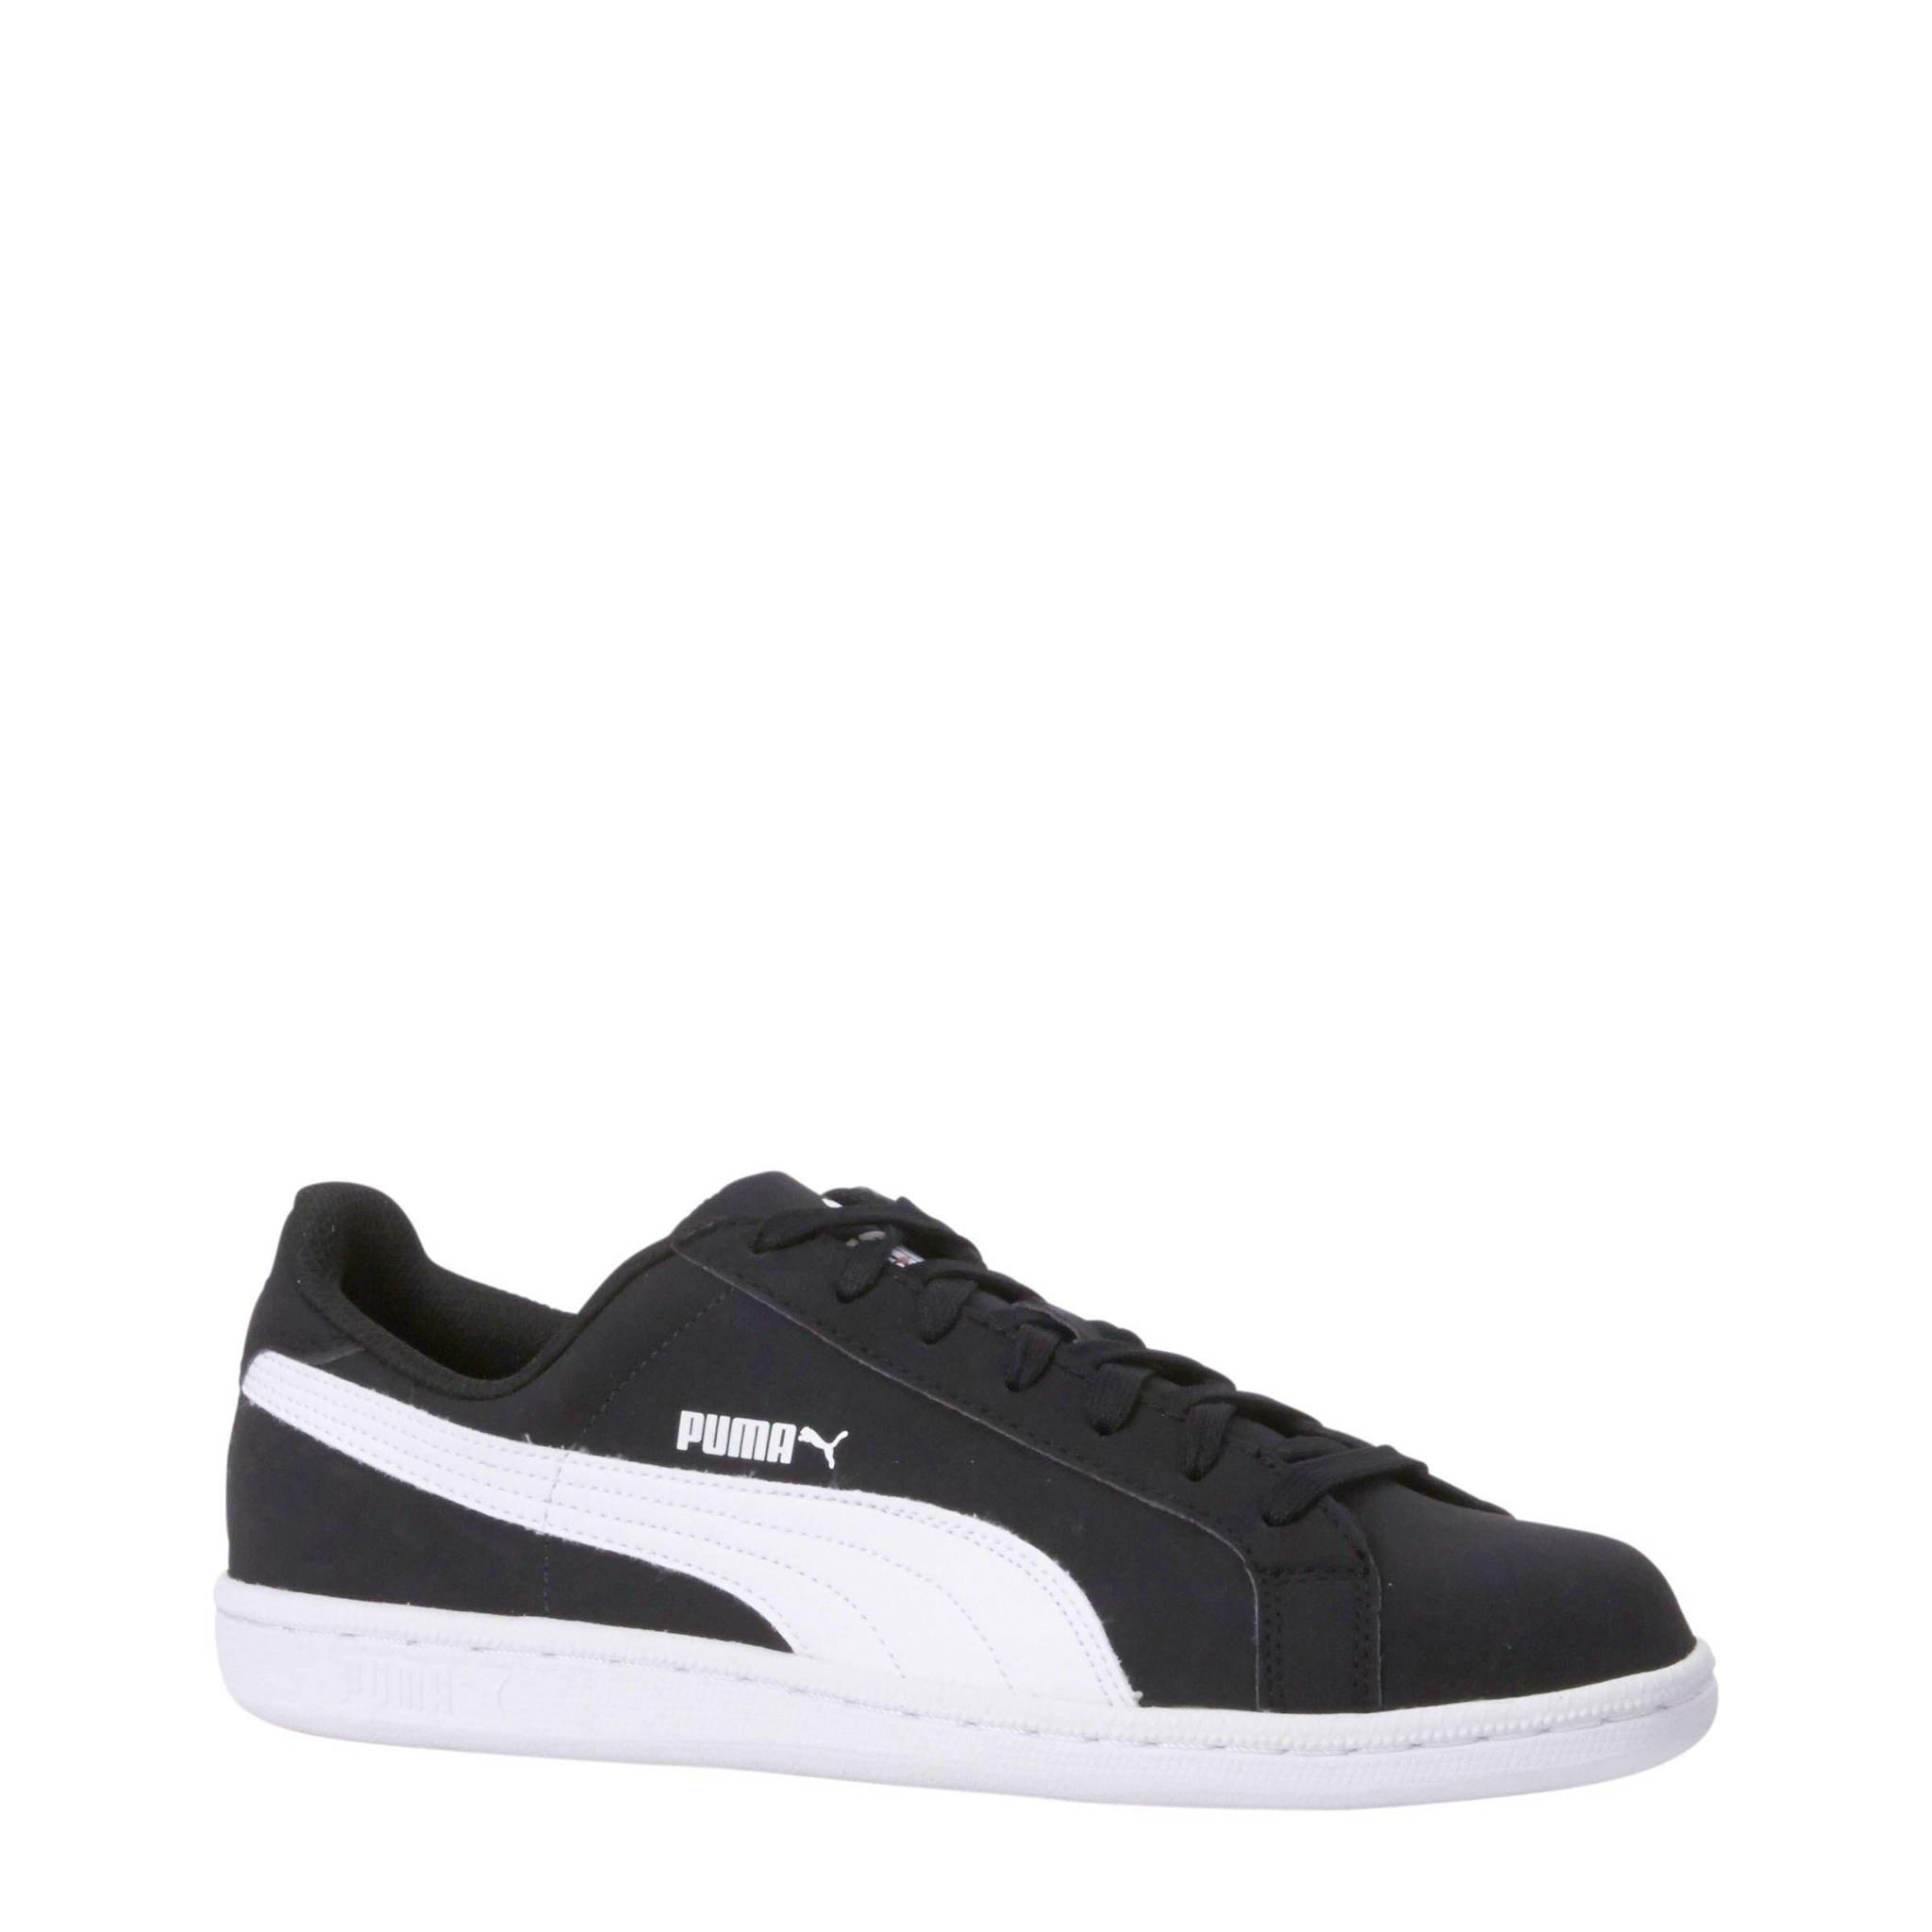 8f44a5acbe1 Puma sneakers Puma Smash Buck | wehkamp